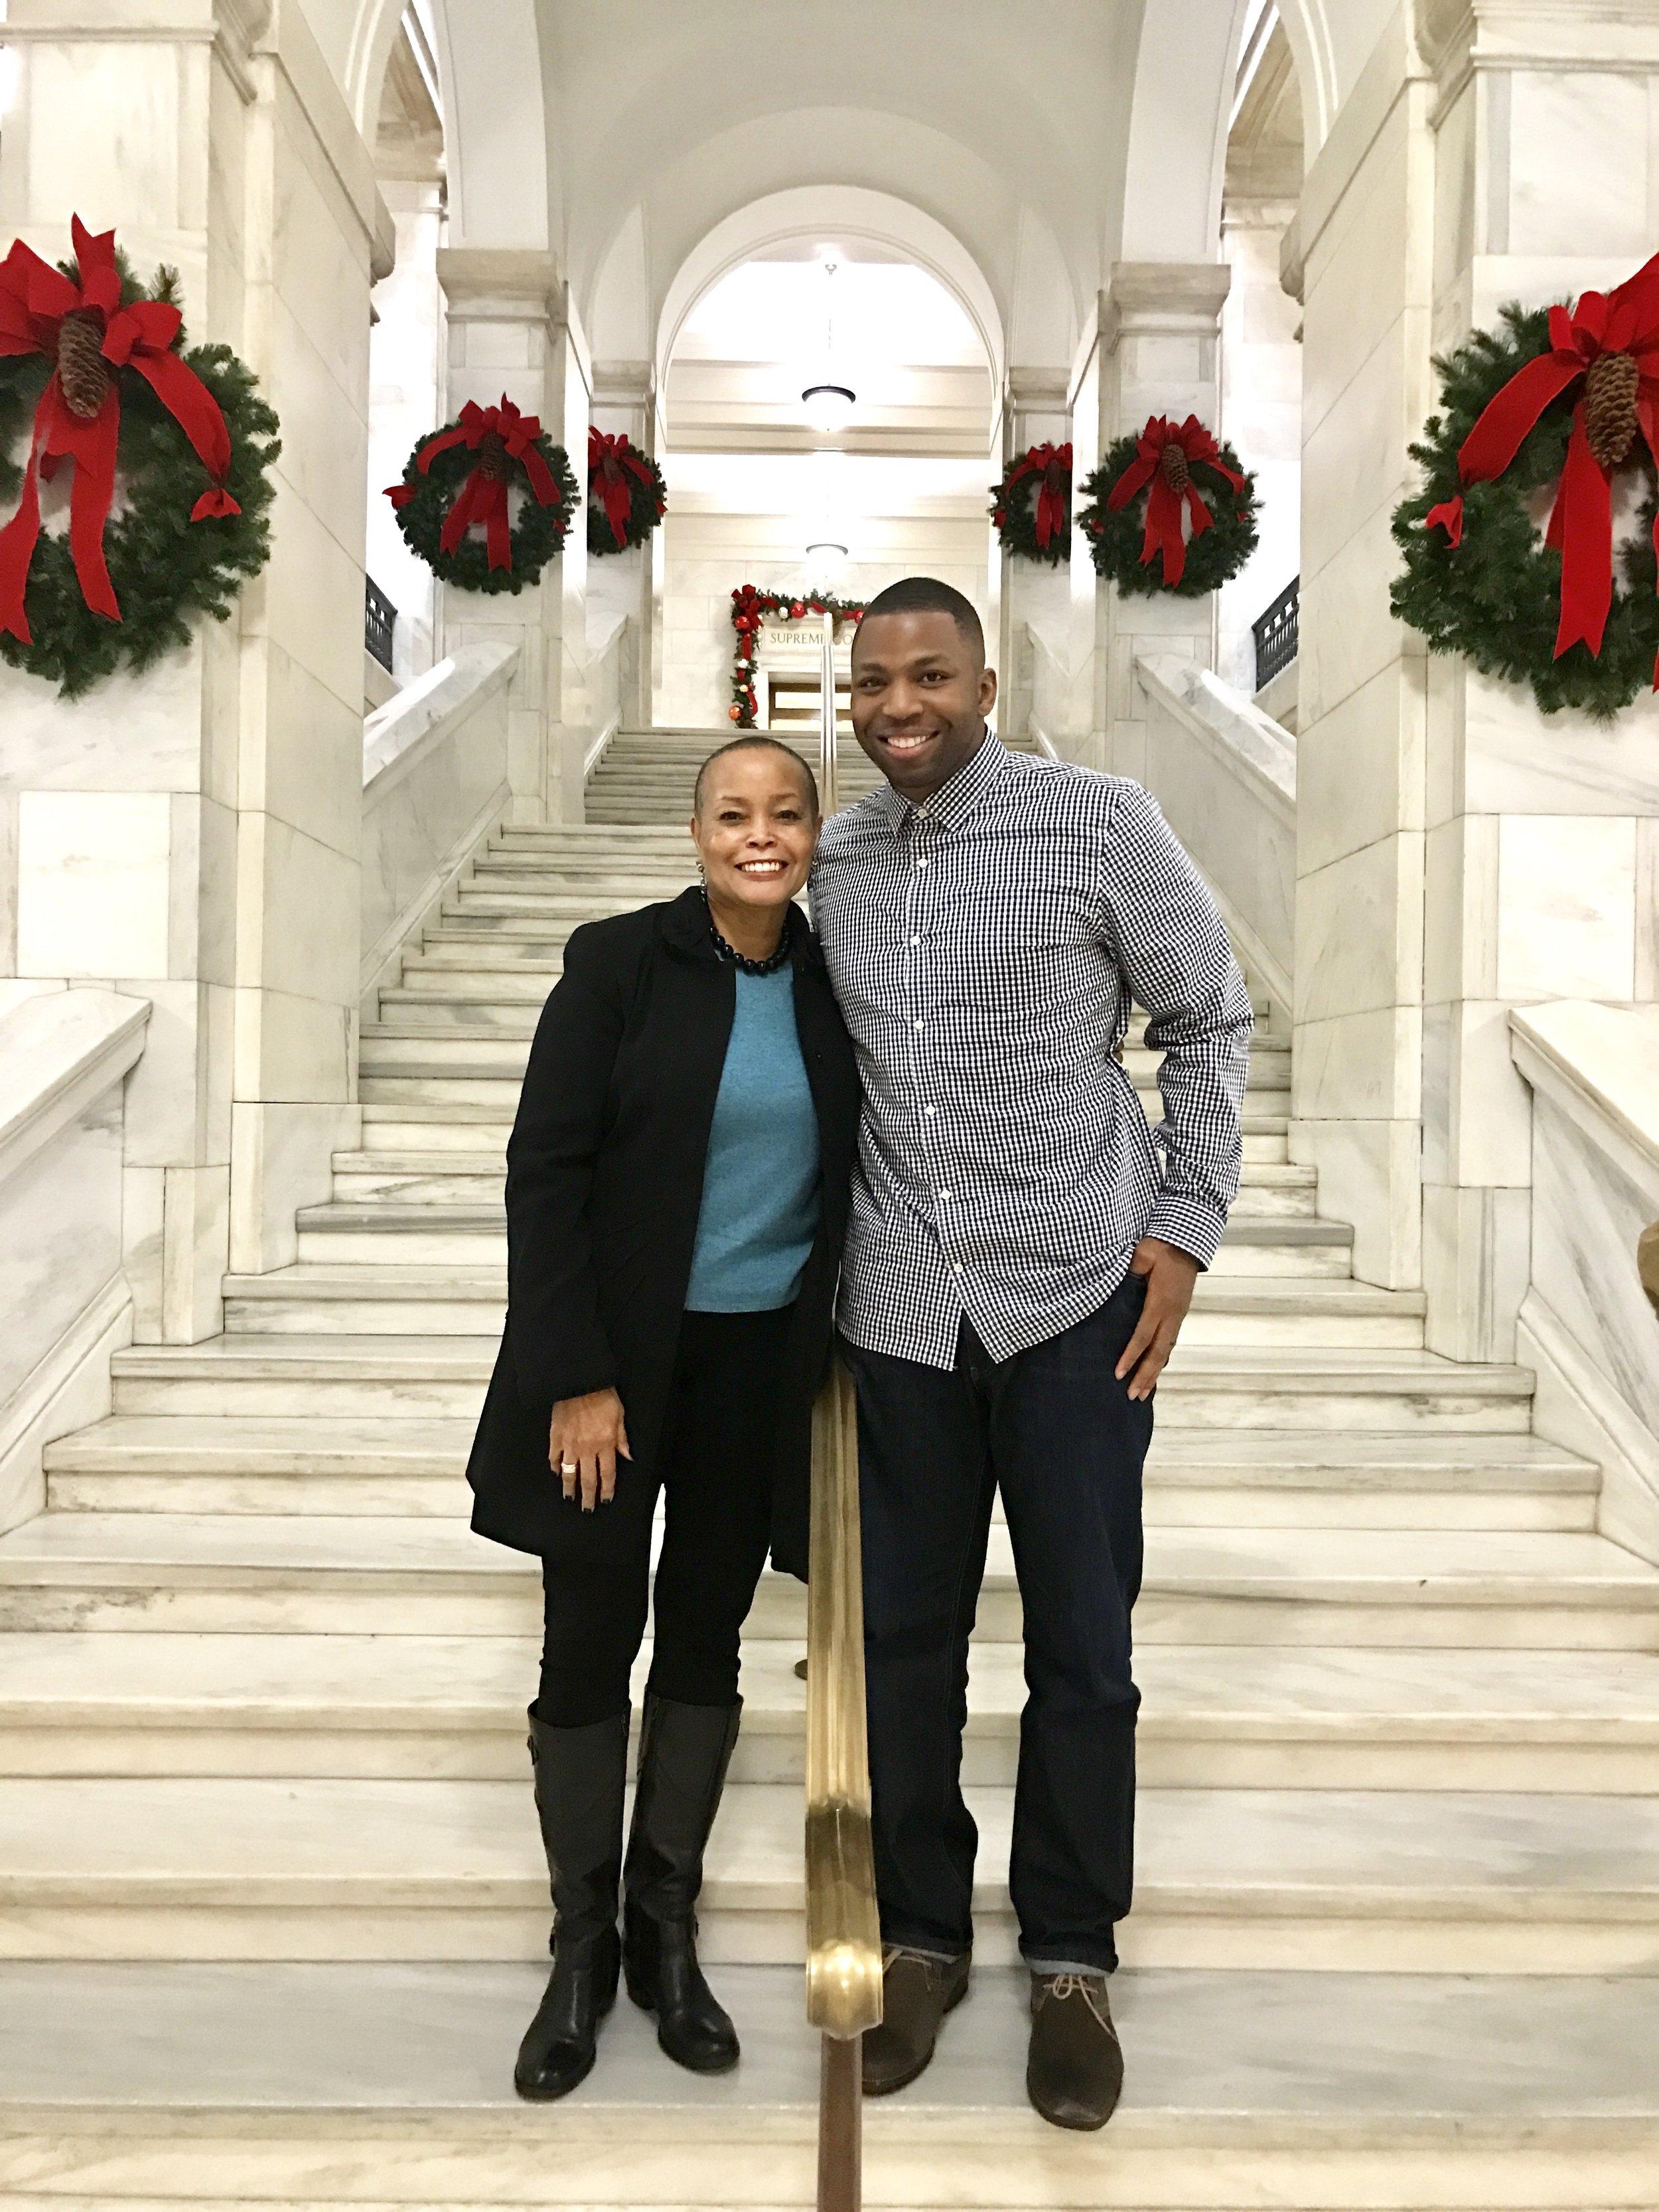 Turk McBride with State Senator Joyce Elliiott at the Arkansas State Capitol Building